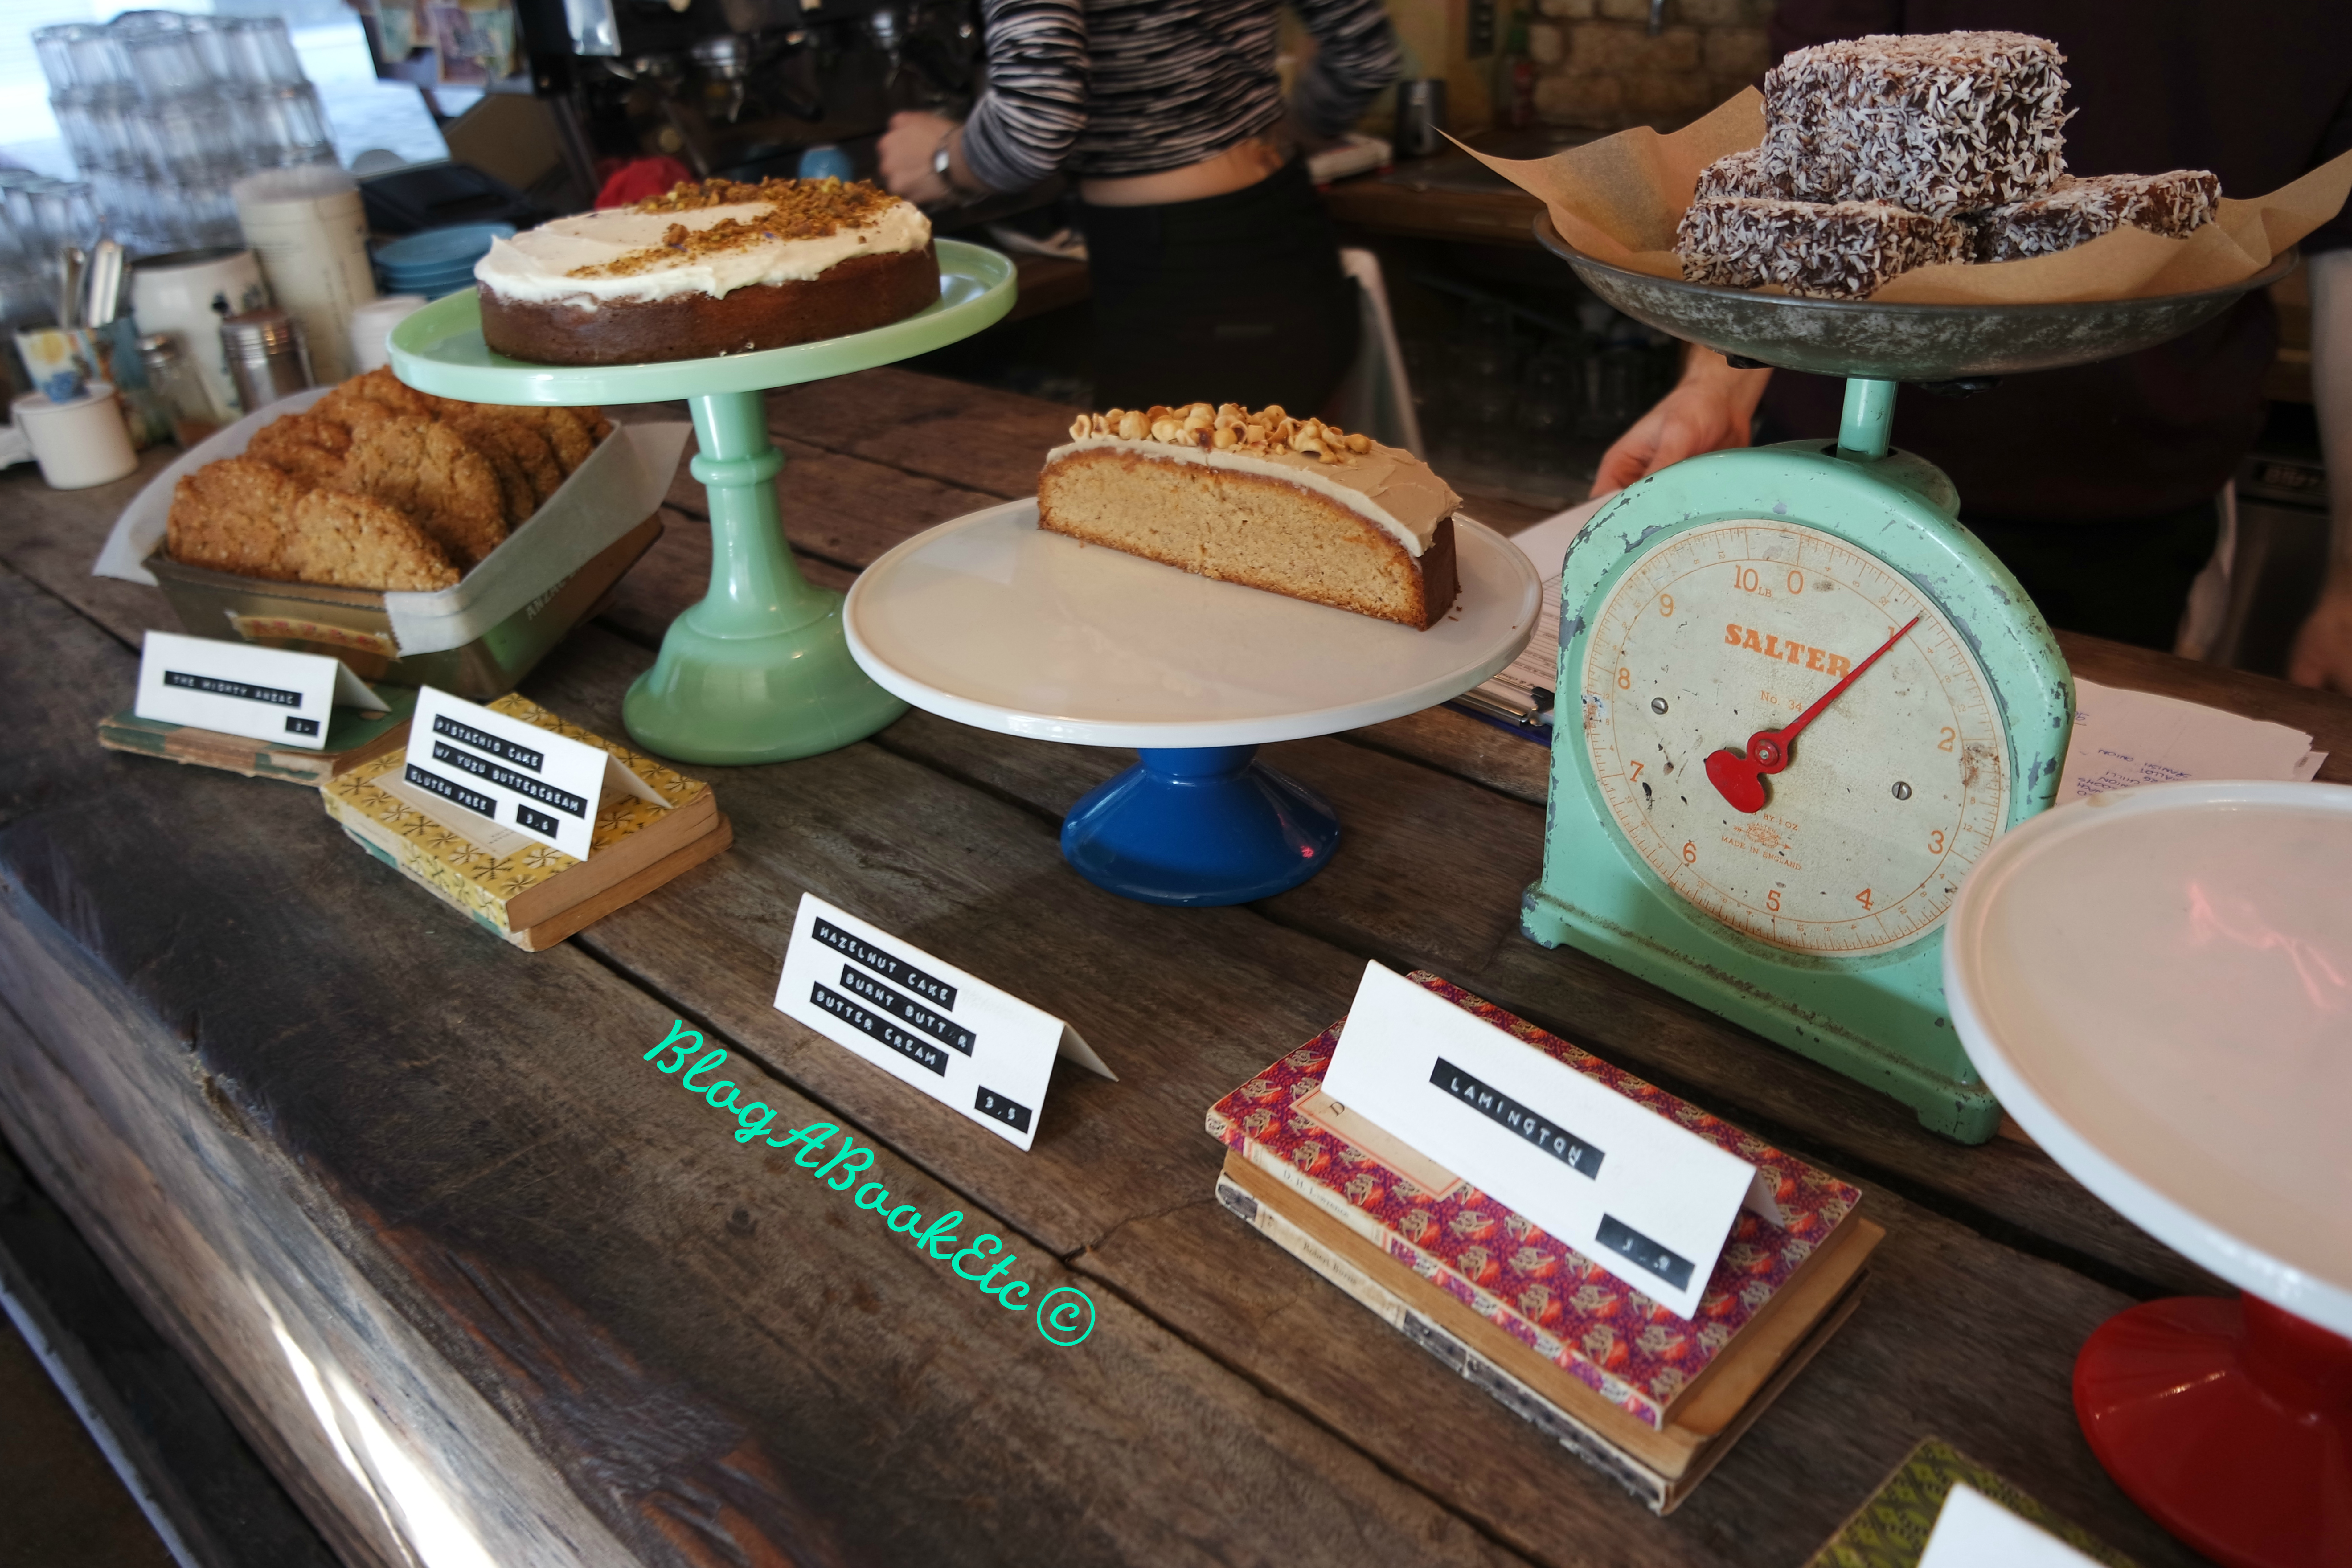 M1LK, Cakes, Desserts, Food, Drink, M1LK, London, Balham, Blog A Book Etc, Fay